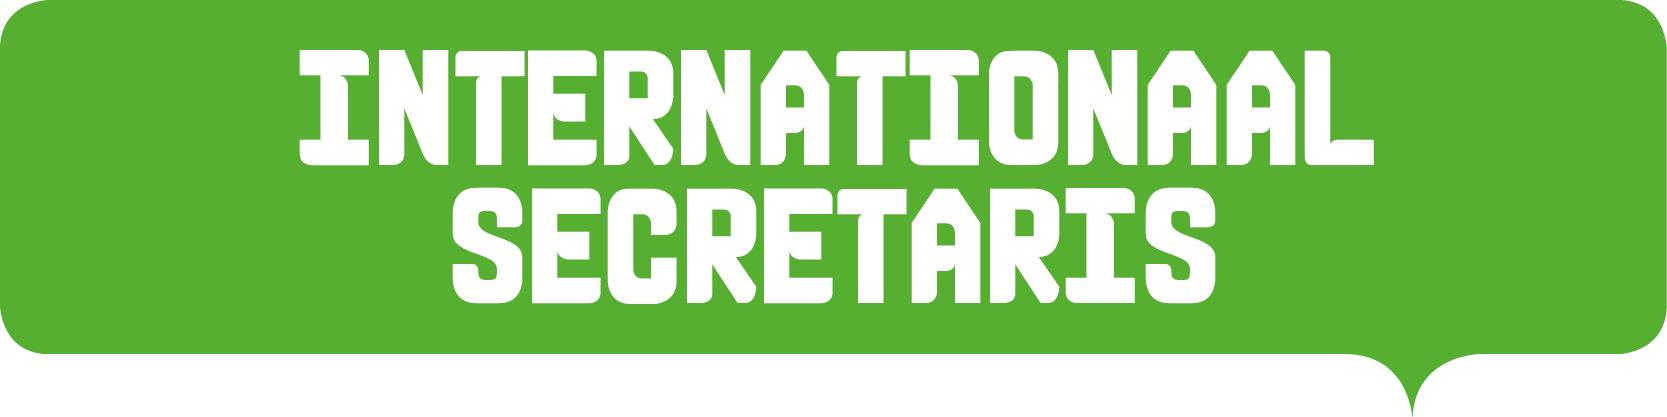 internationaal secretaris